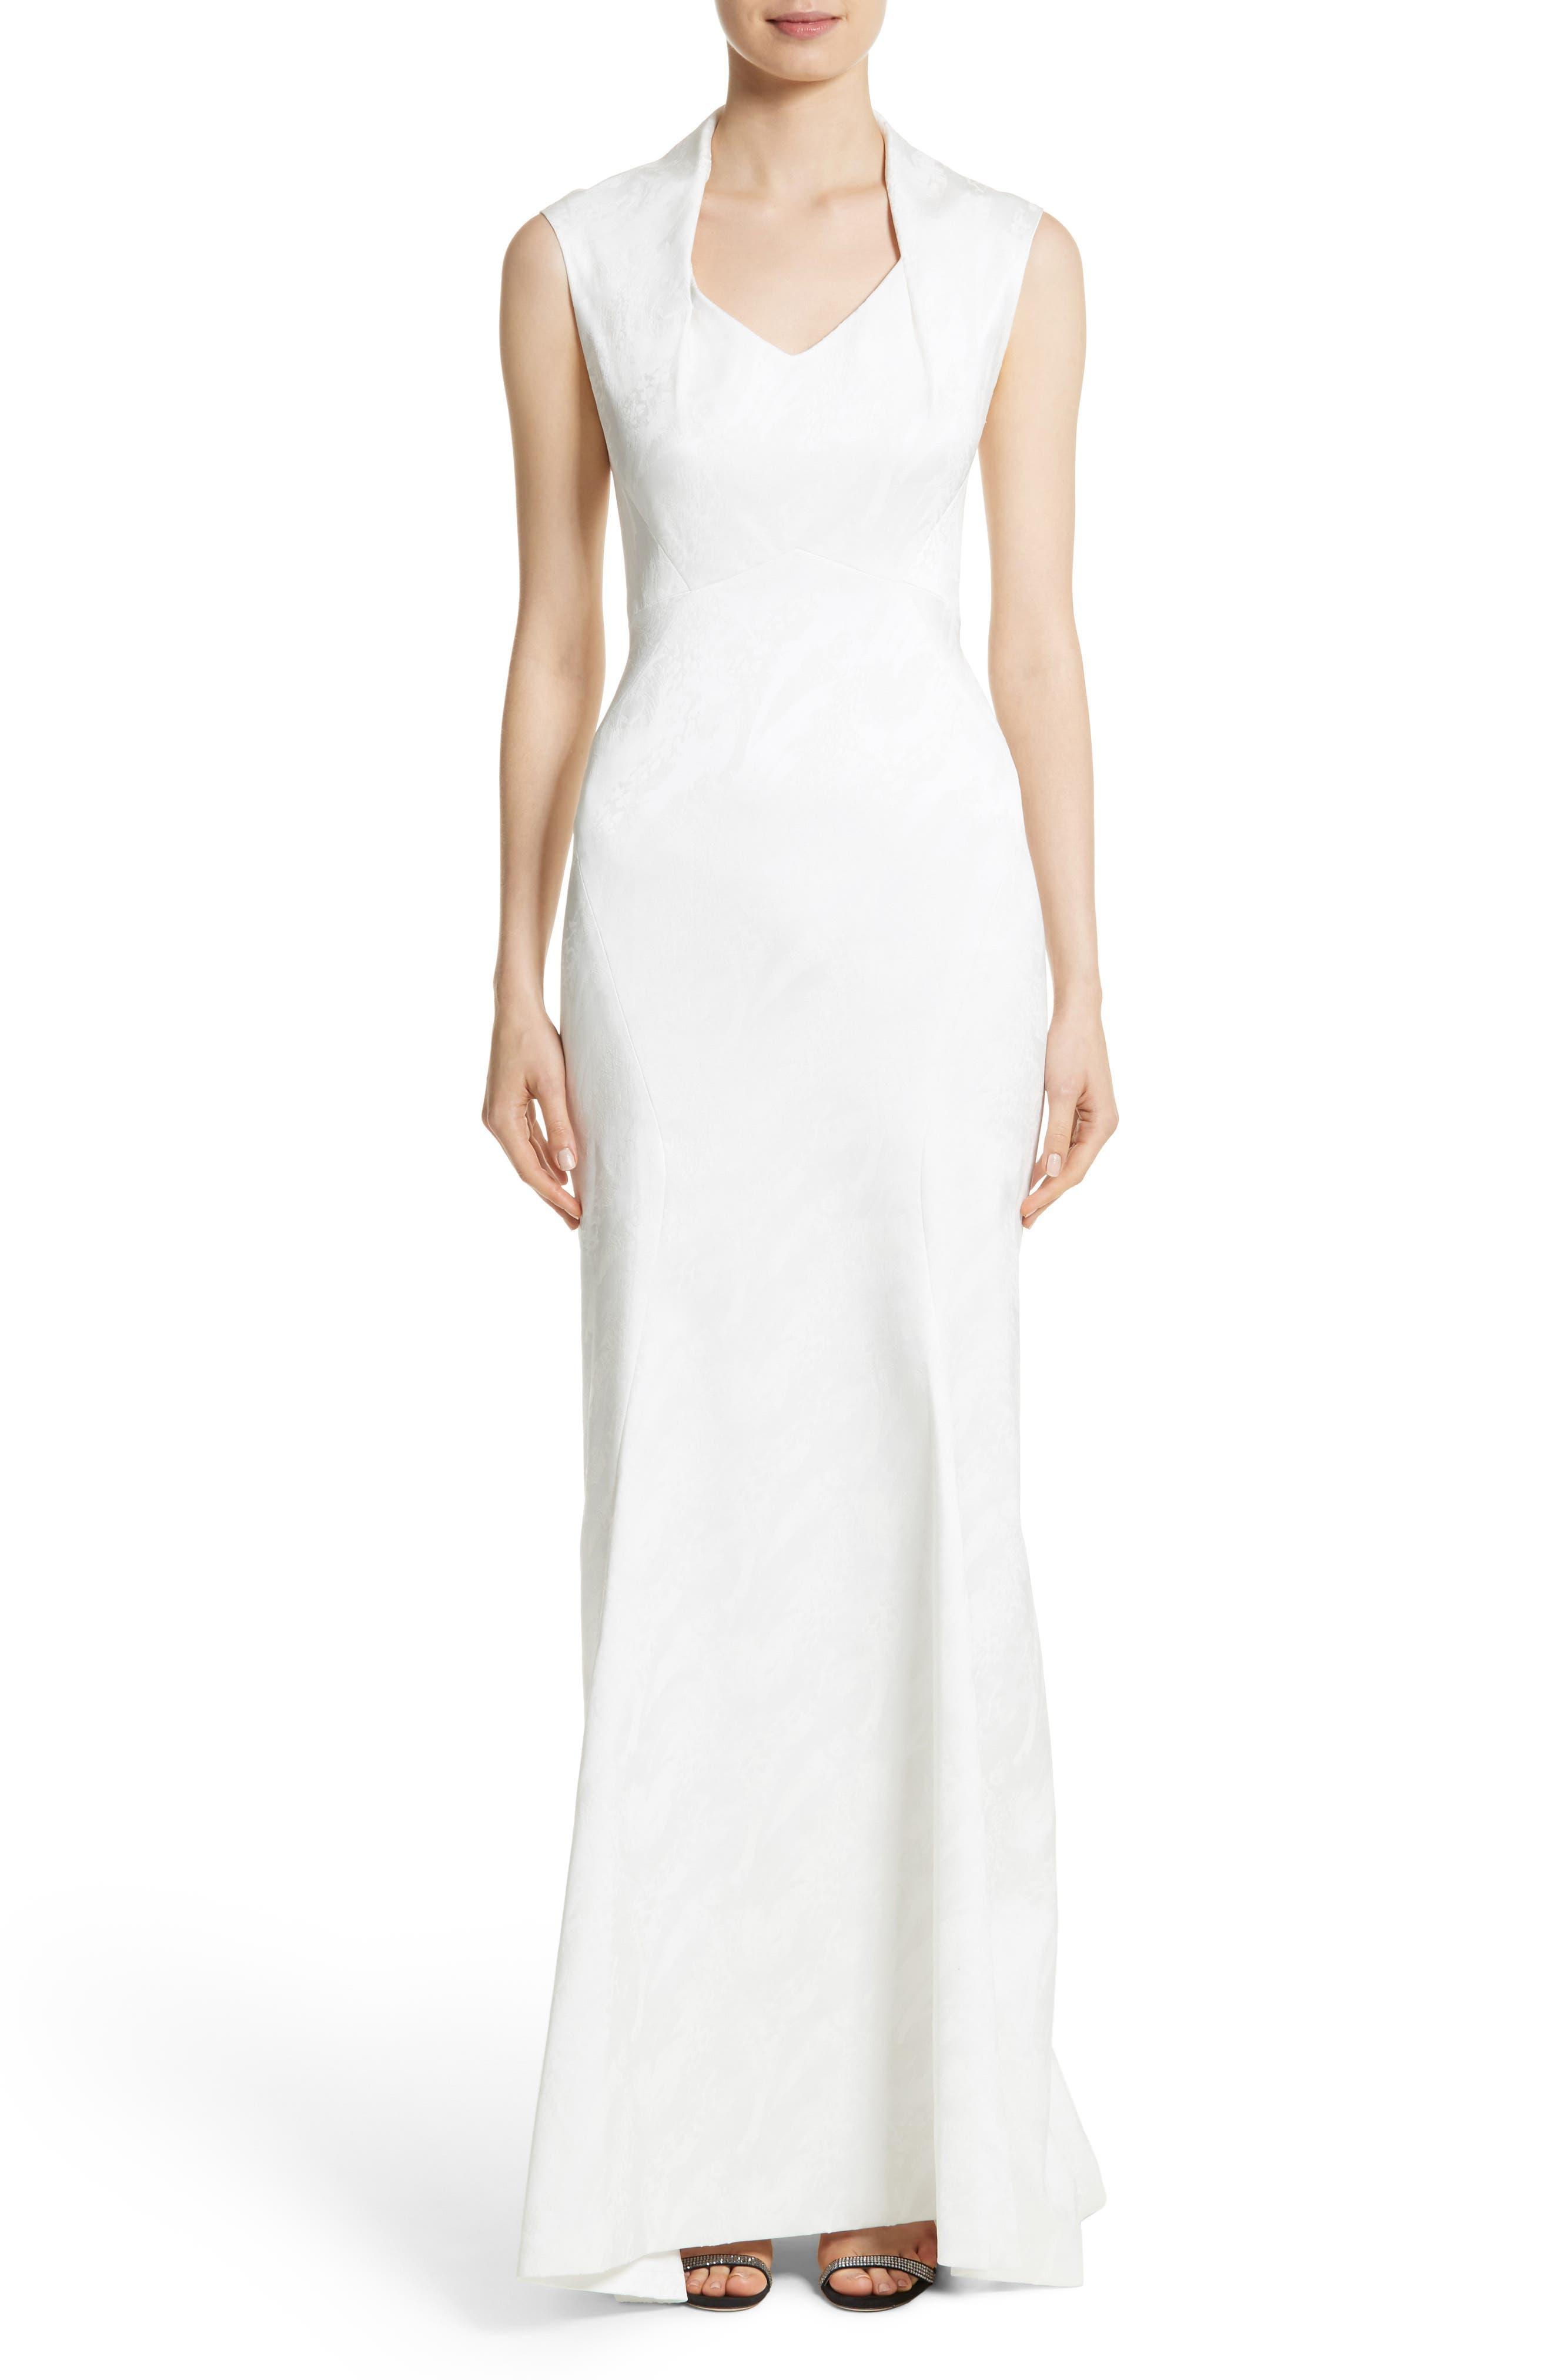 Main Image - Zac Posen Sleeveless Jacquard Gown